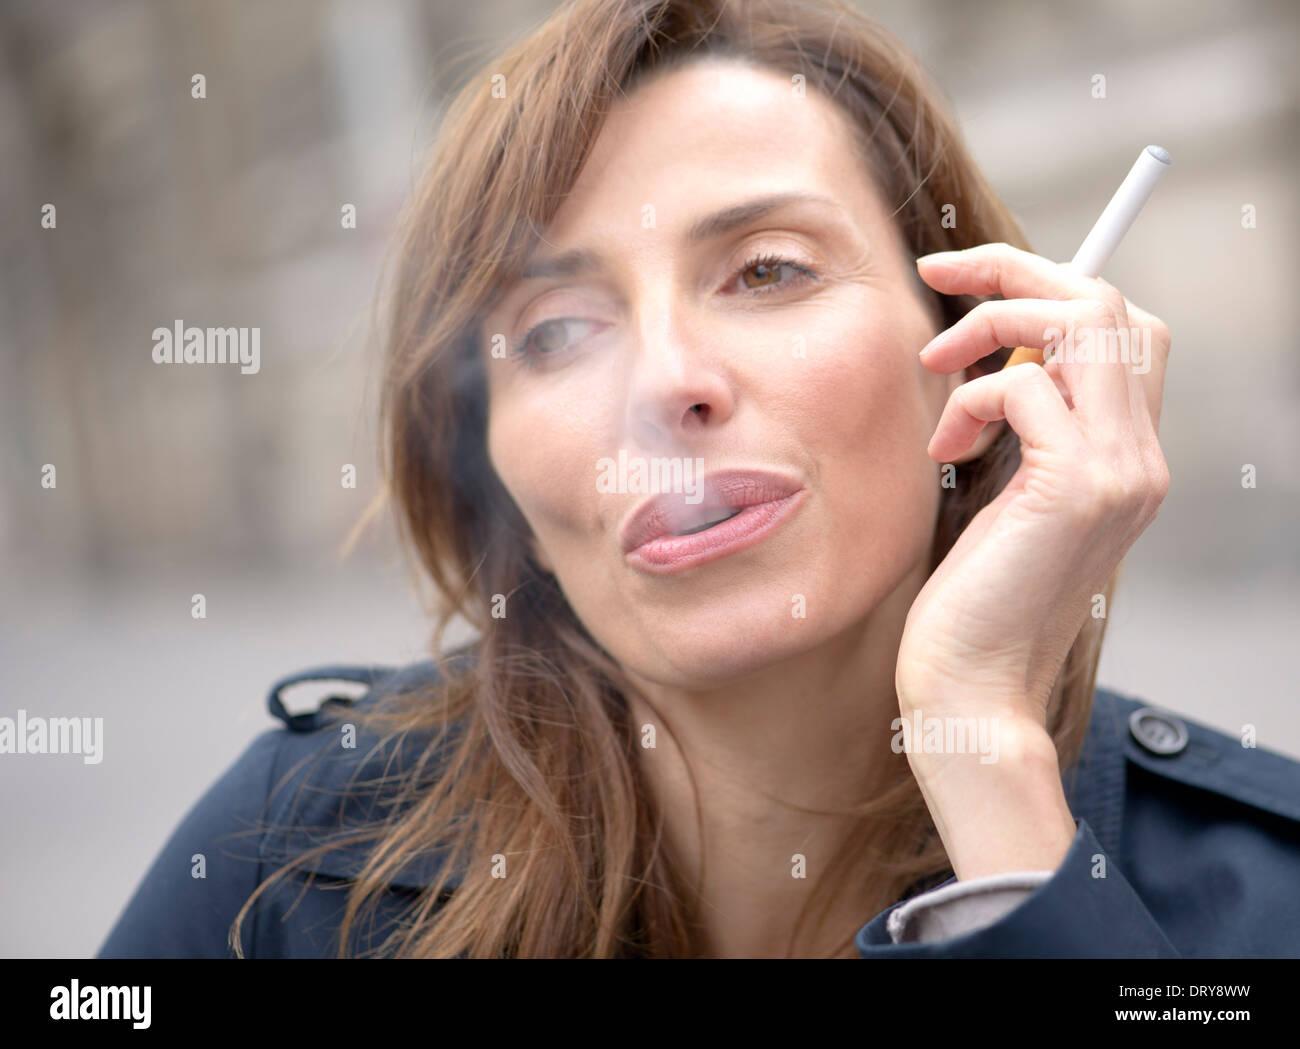 Woman smoking electronic cigarette - Stock Image